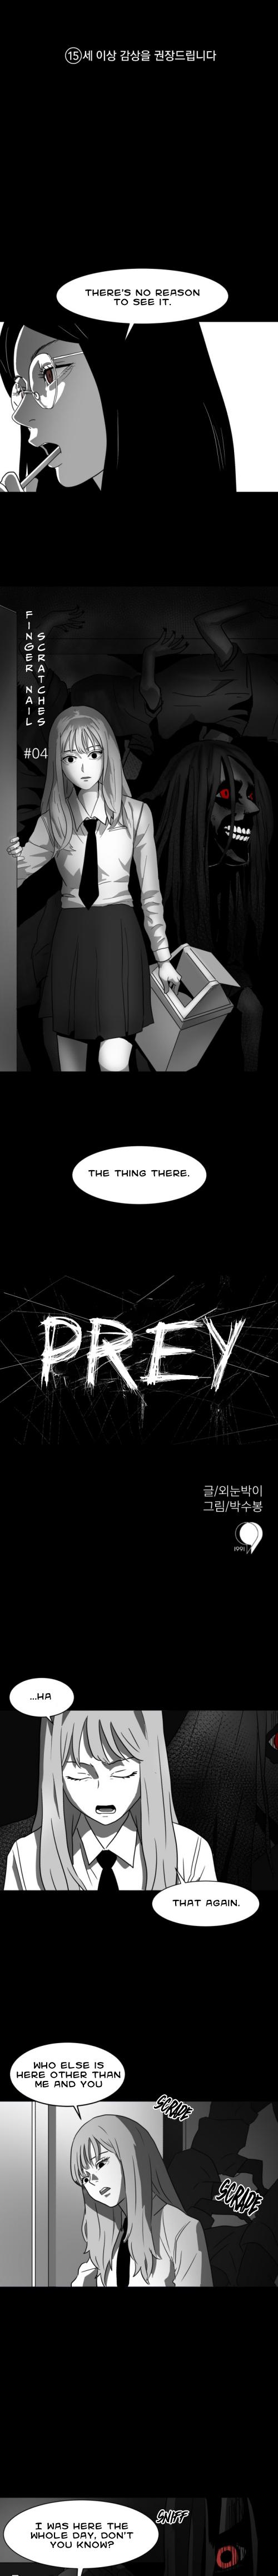 https://img2.nineanime.com/comics/pic2/8/26824/621446/8ffce3d46f68ca02795dbffec64095f1.jpg Page 1